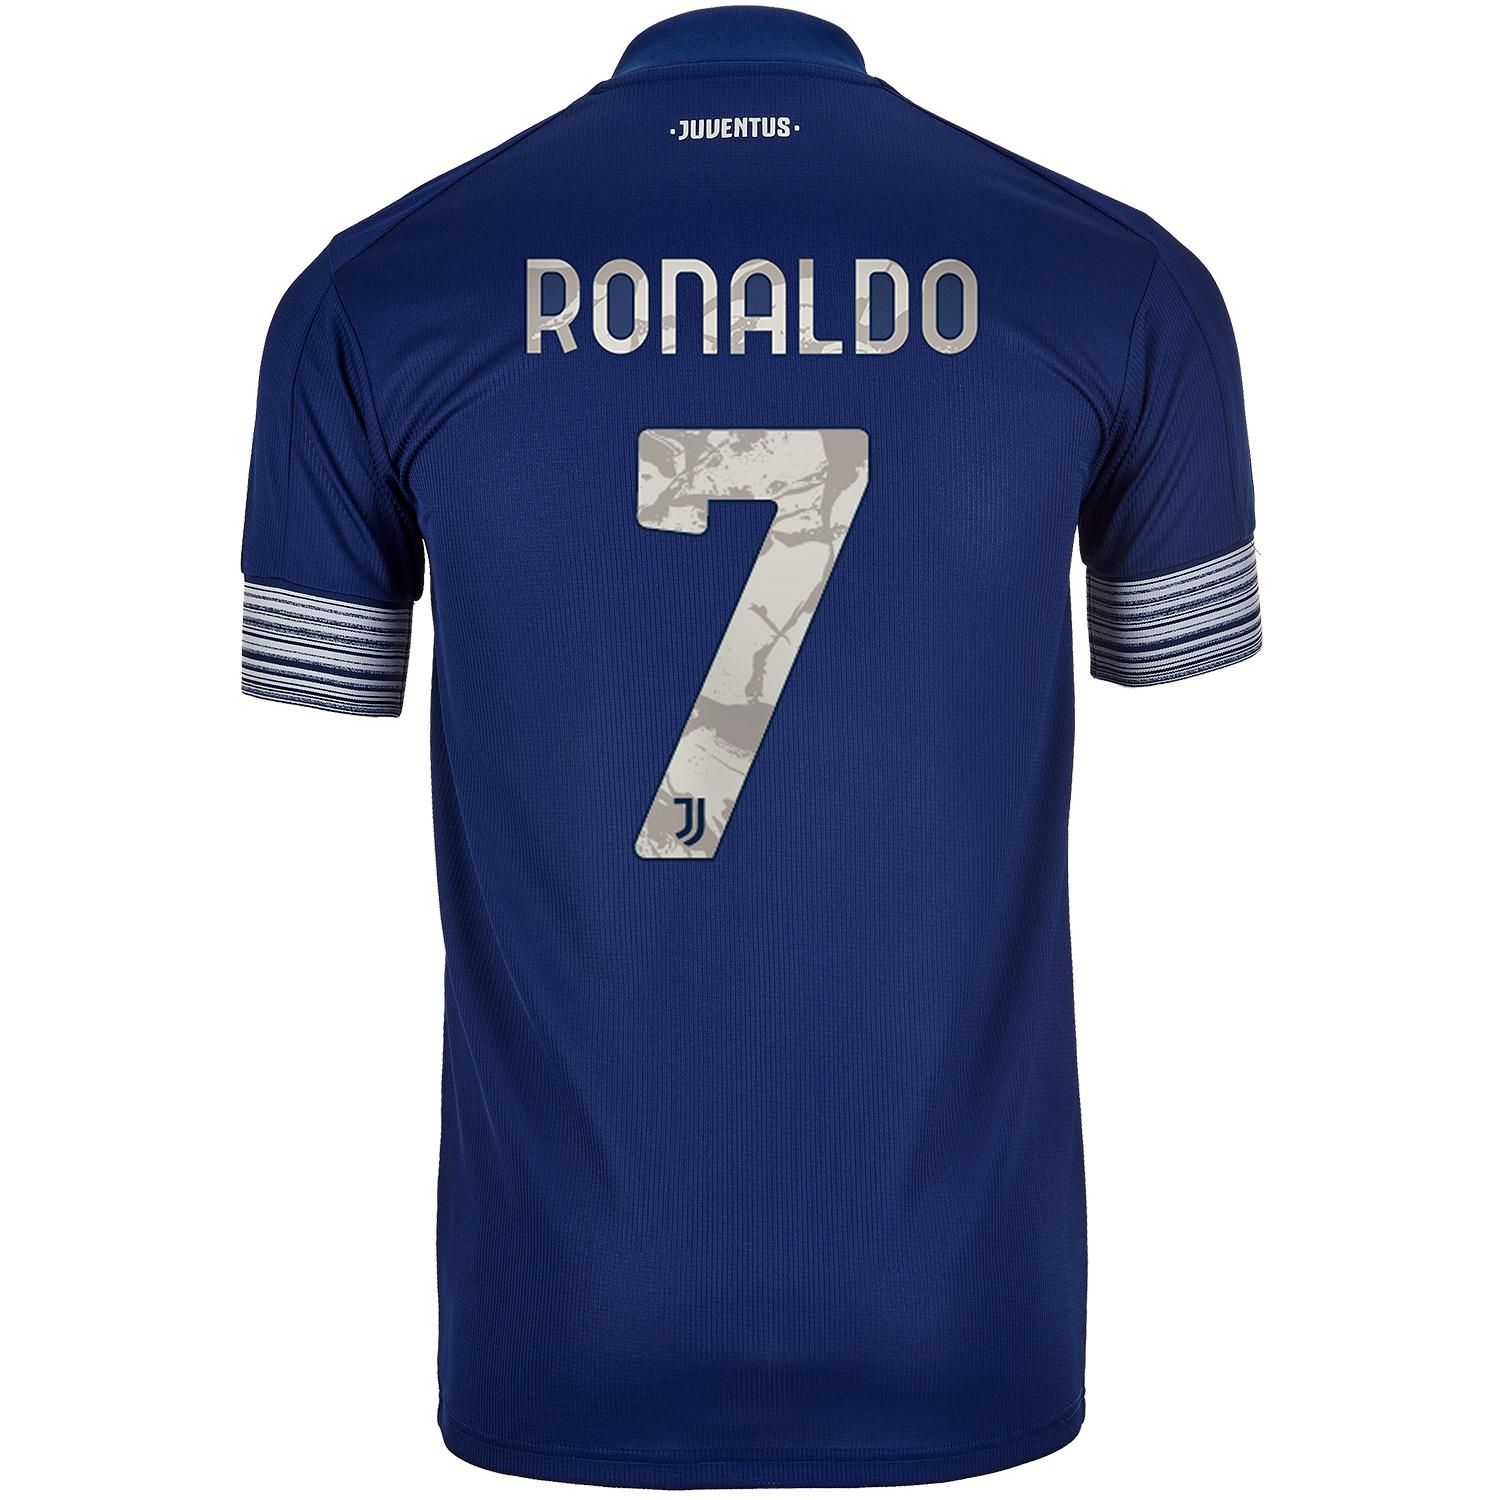 2020 21 Adidas Cristiano Ronaldo Juventus Away Jersey Soccerpro